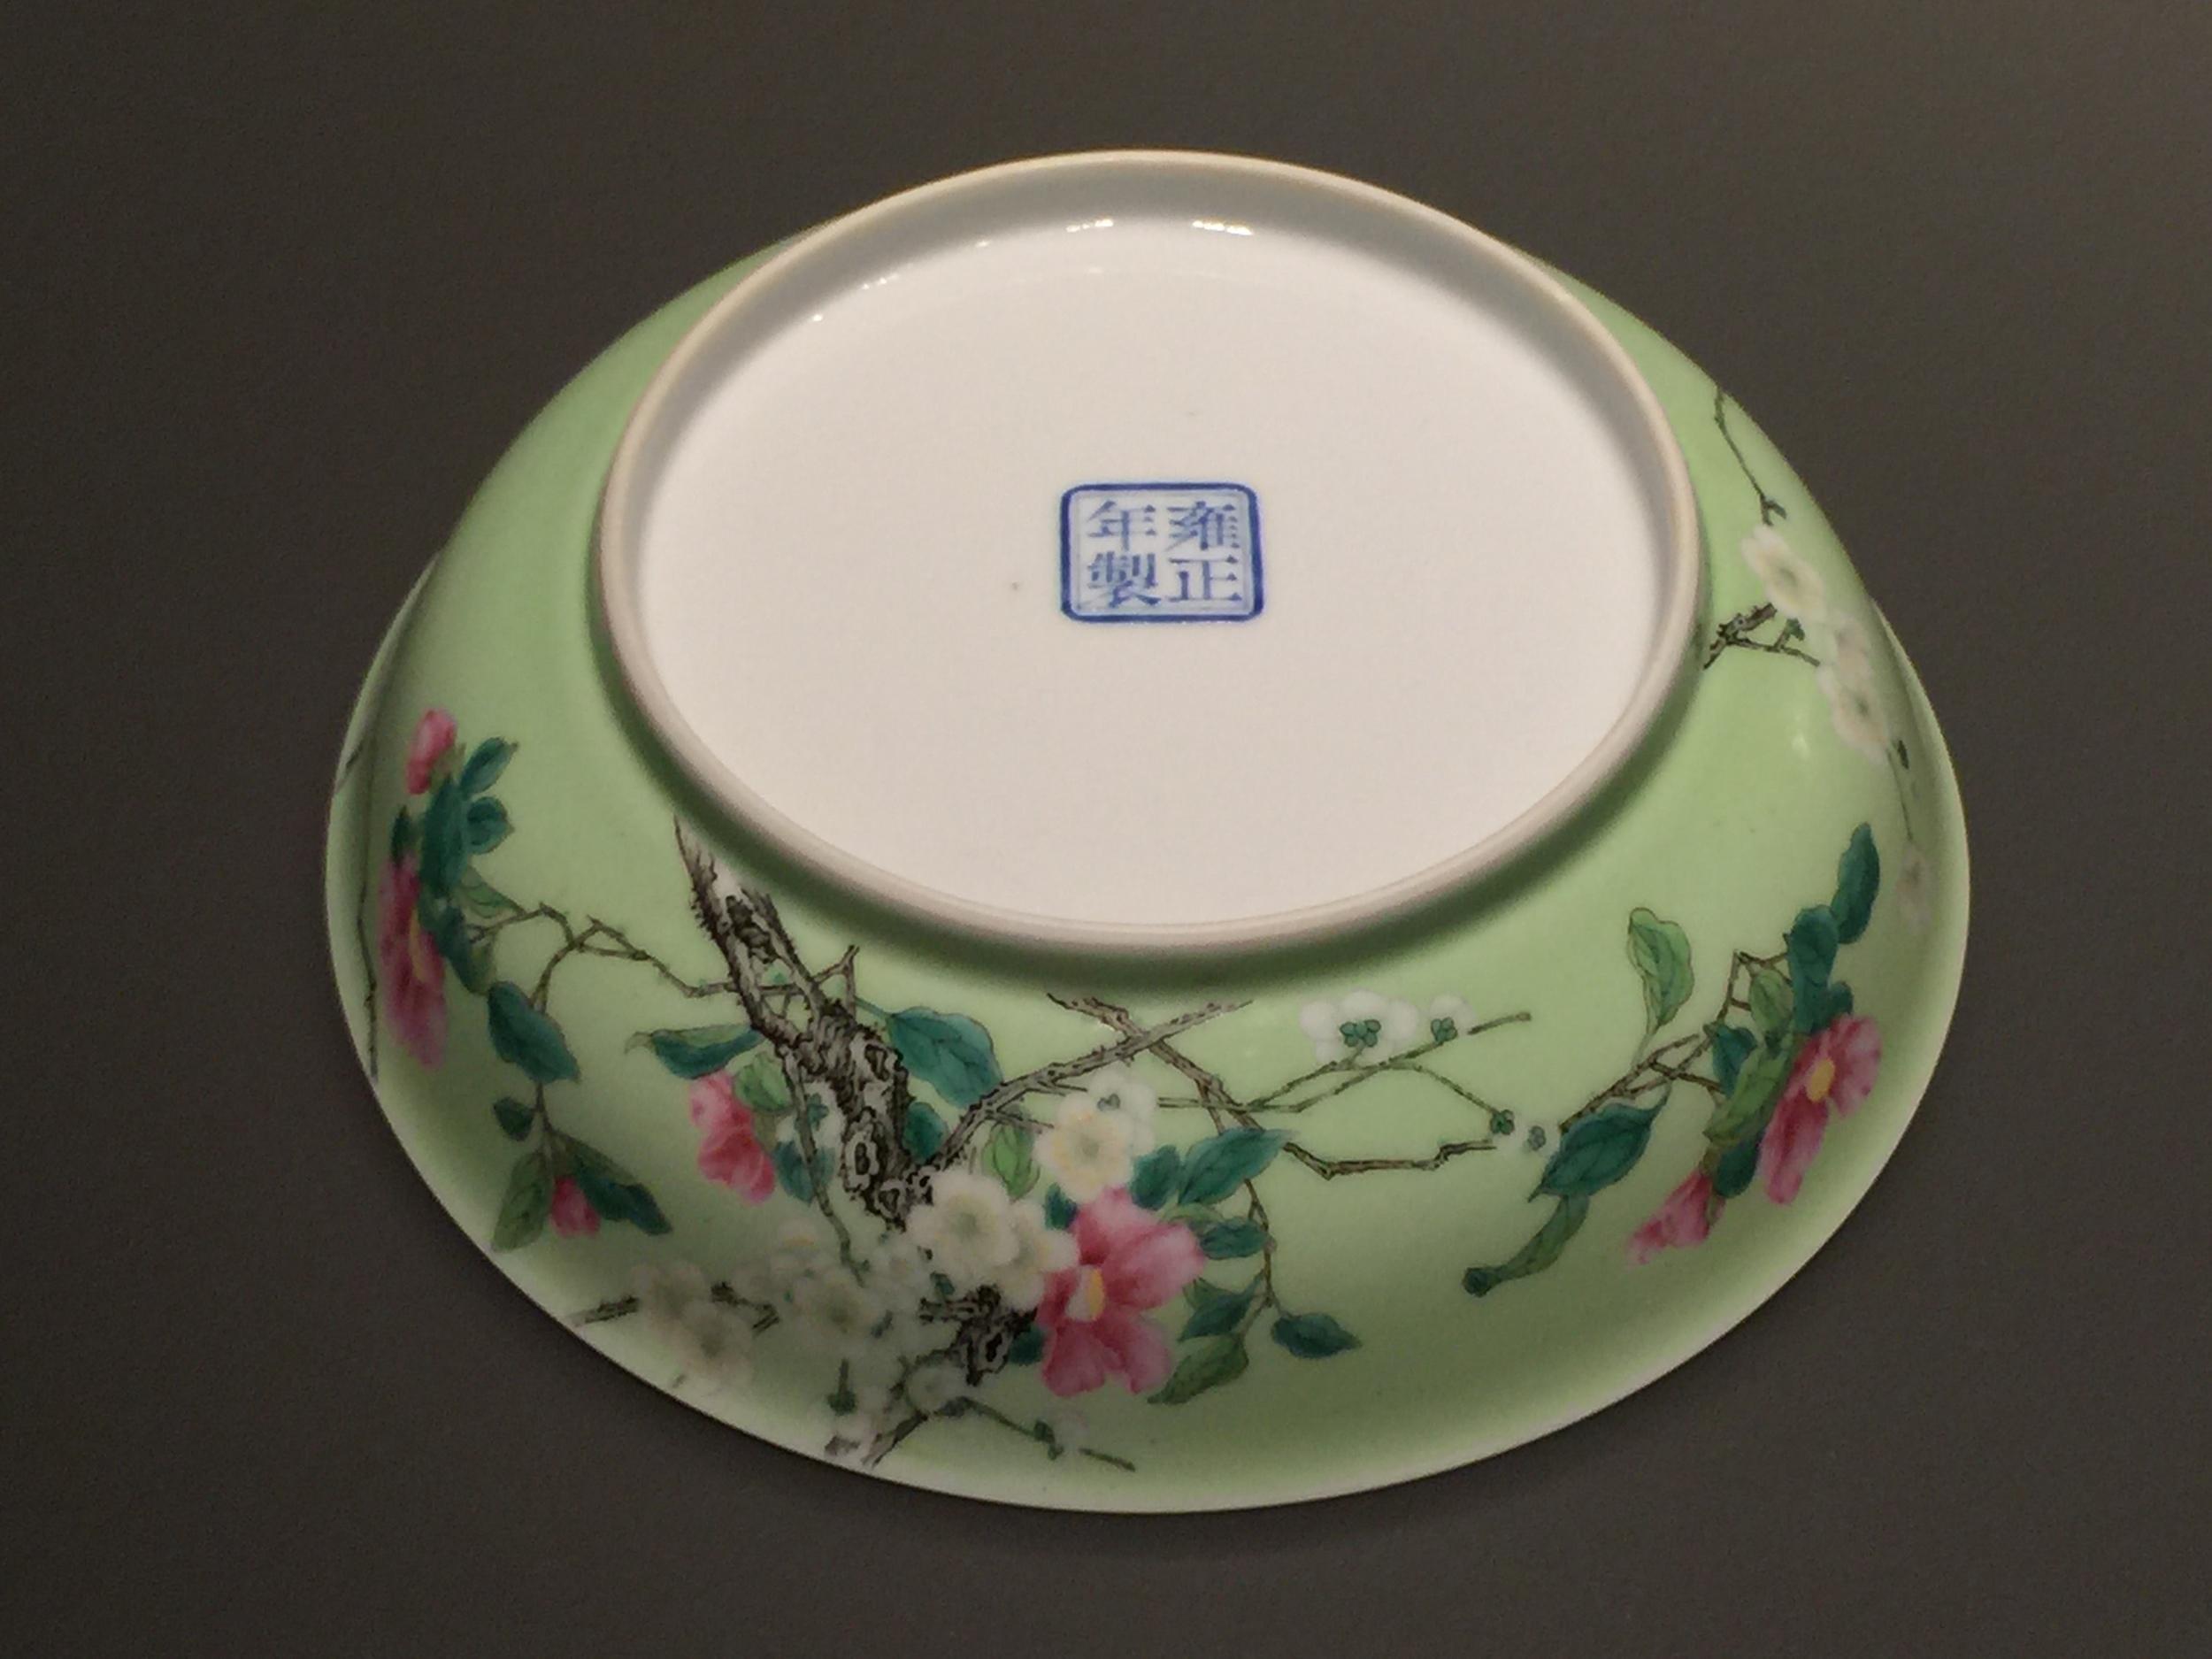 Chinese-Porcelain-British-Museum-Percival-David-jessewaugh.com-137.jpg